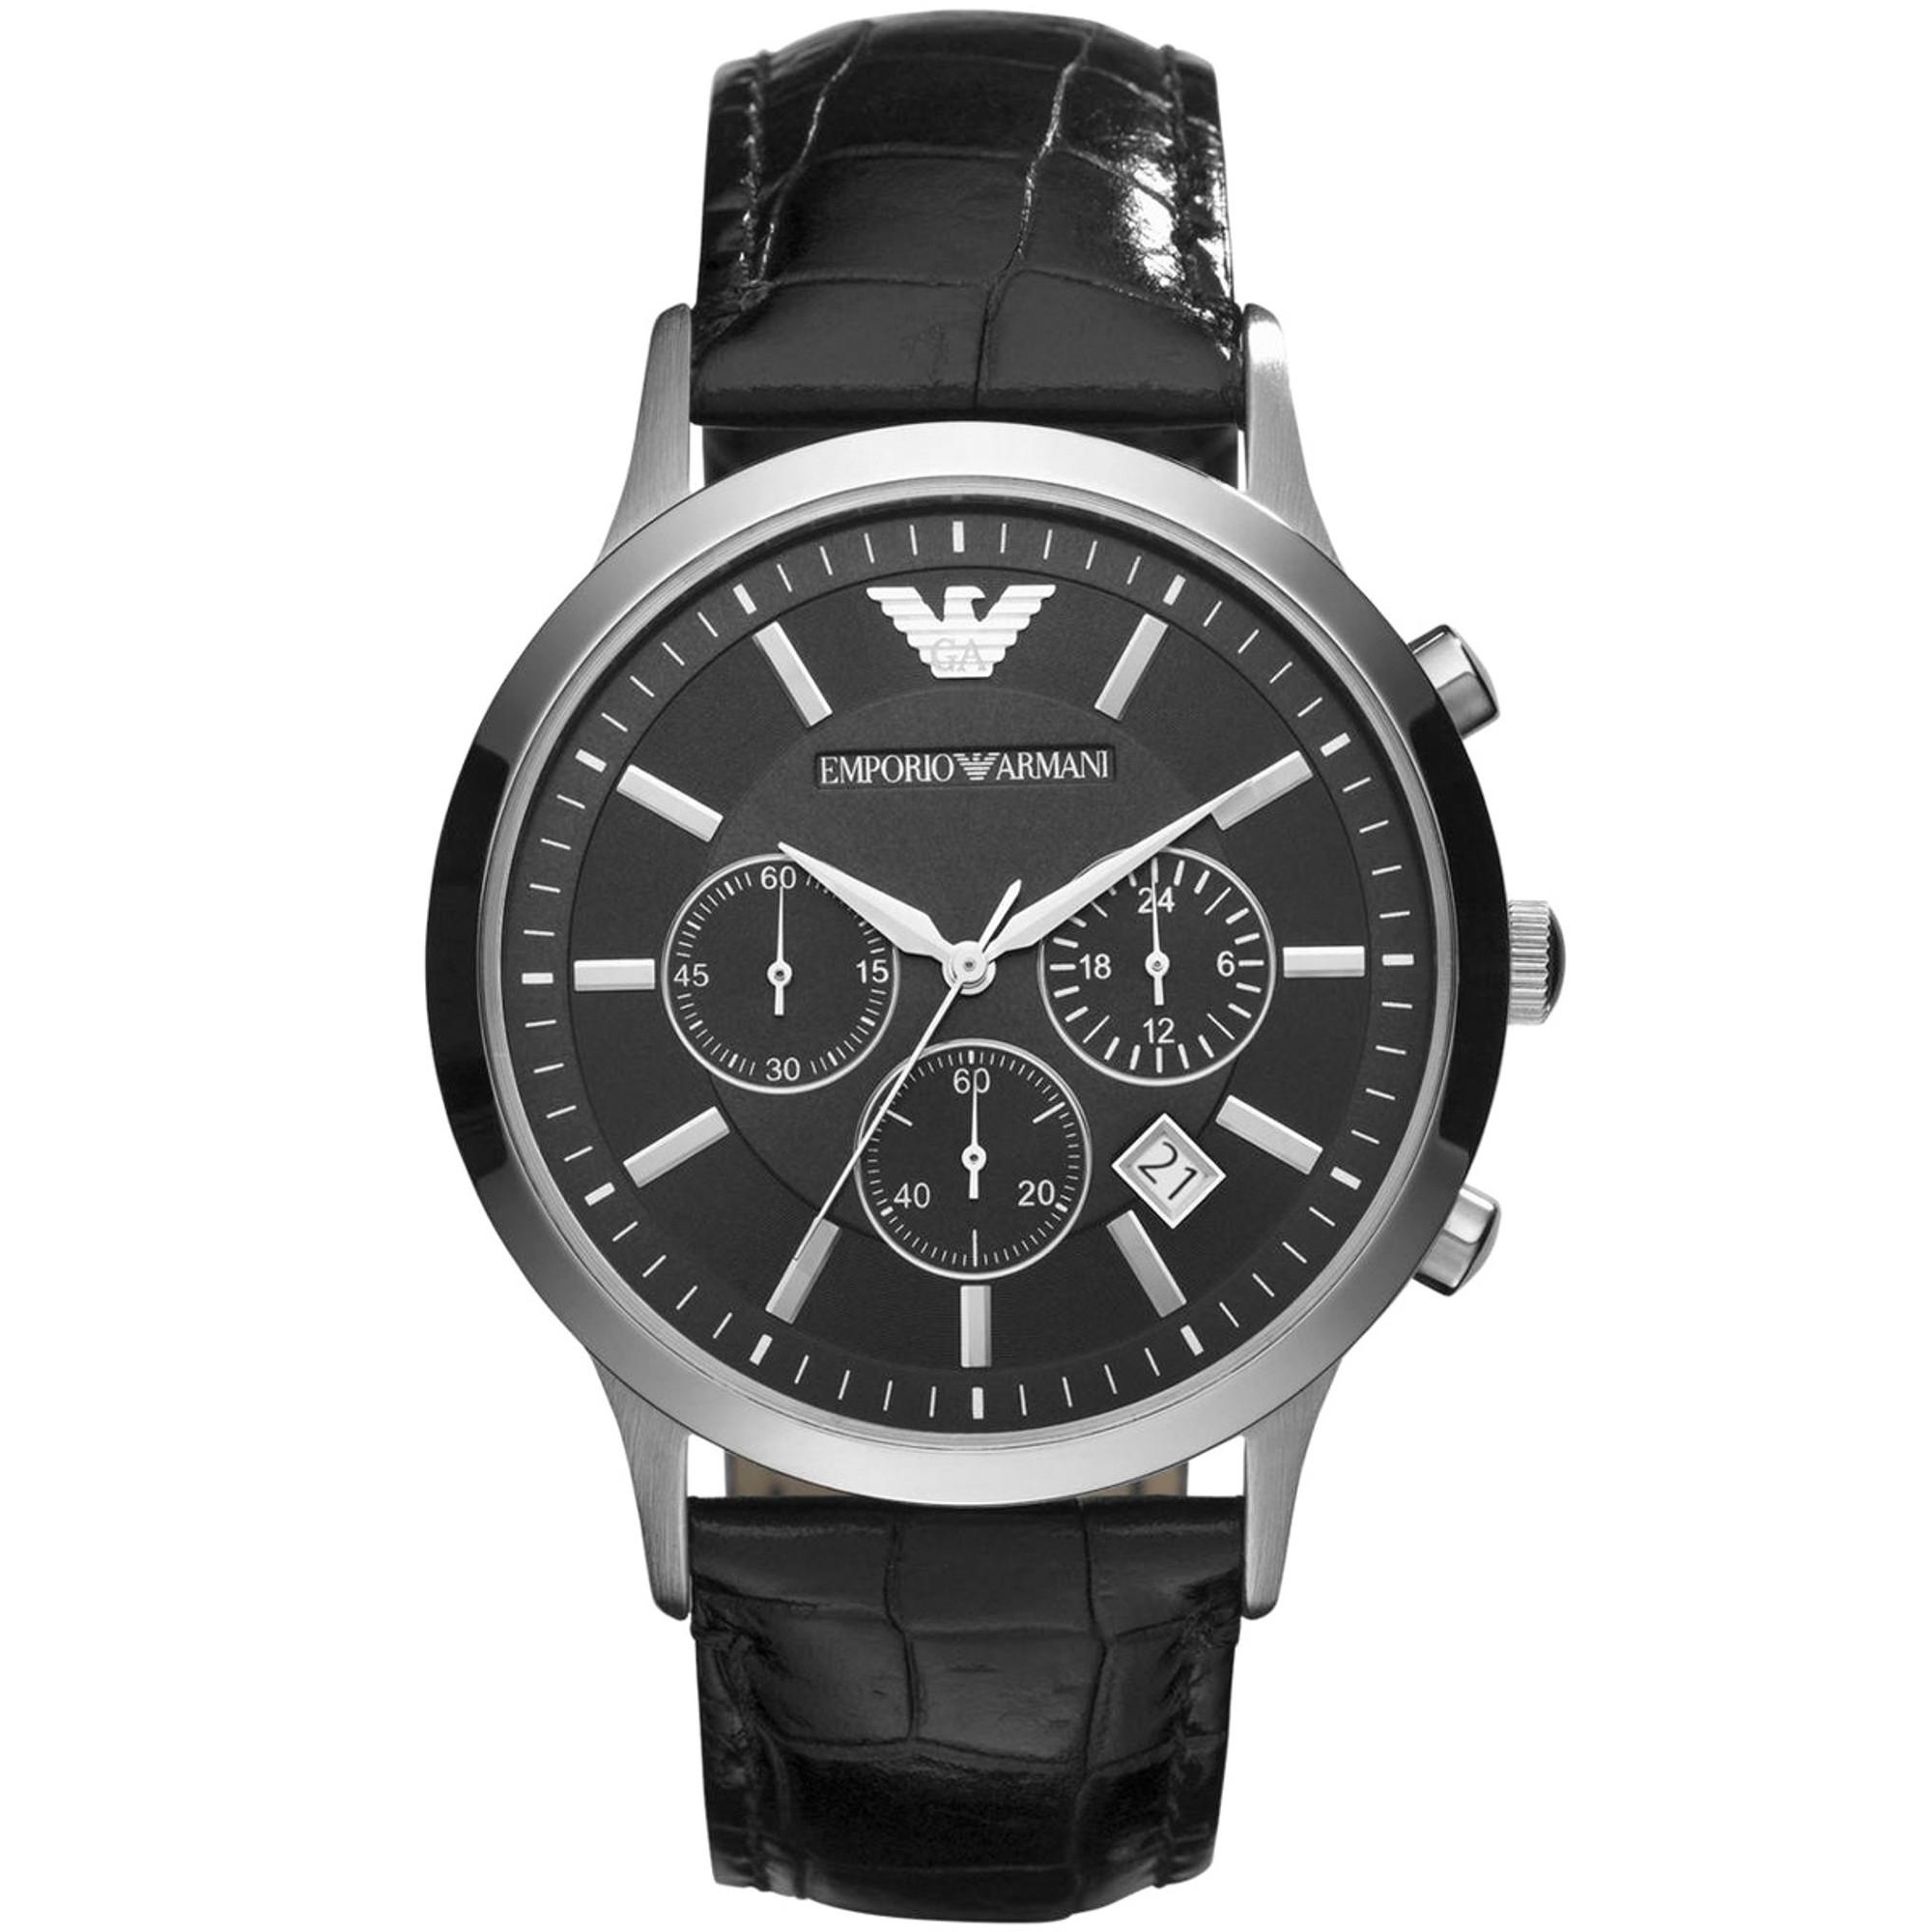 EMPORIO ARMANI Classic Watch Chronograph AR2447